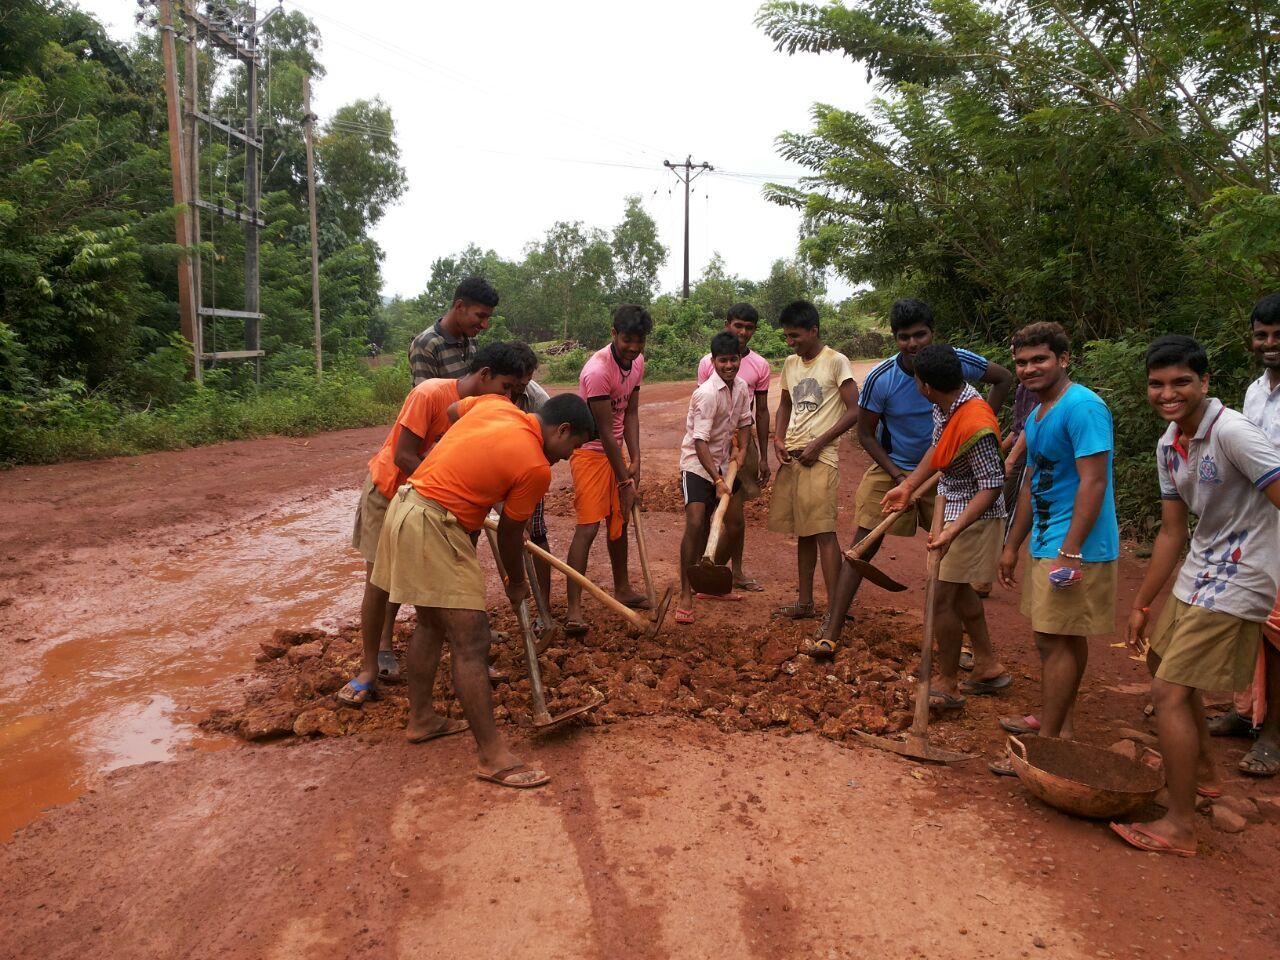 Travel resumes after RSS Swayamsevaks repaired 13 km road at Manjeshwar, Kasaragod